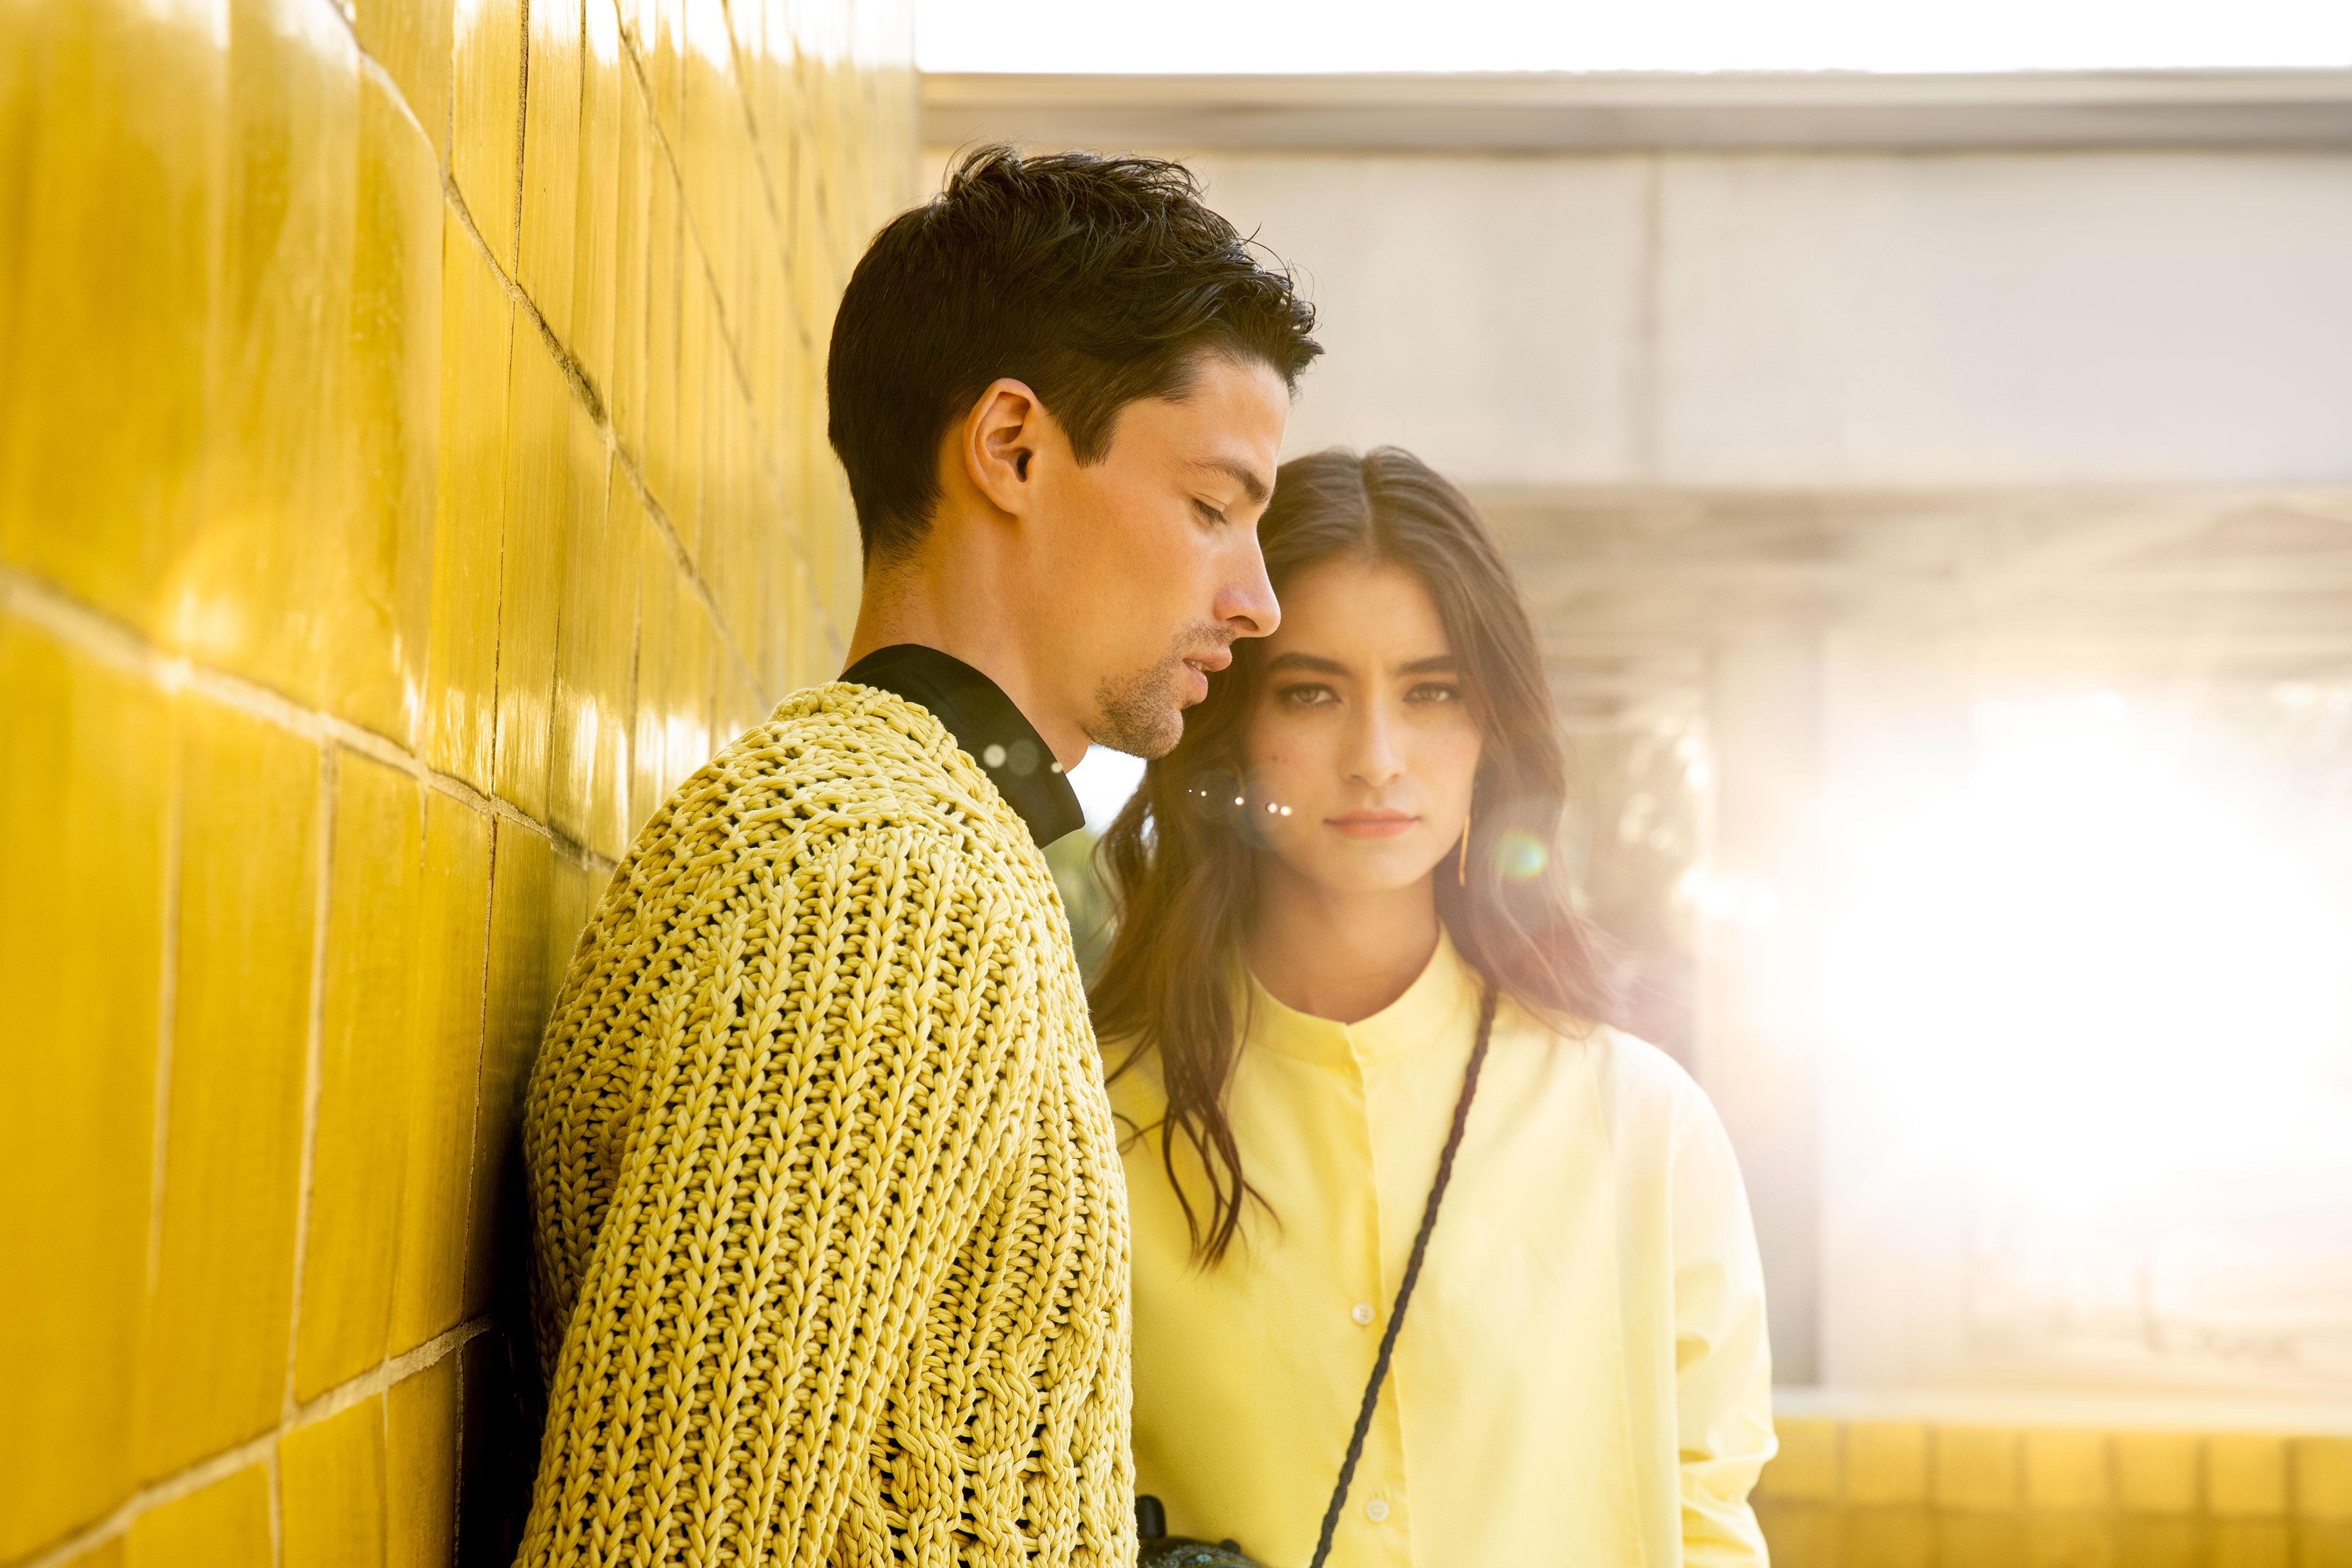 El Libro Amarillo - él: suéter Salvatore Ferragamo _ camisa Ermenegildo Zegna Couture / ella: blusa Salvatore Ferragamo _ bolso Carla Fernández _ aretes Zaavia